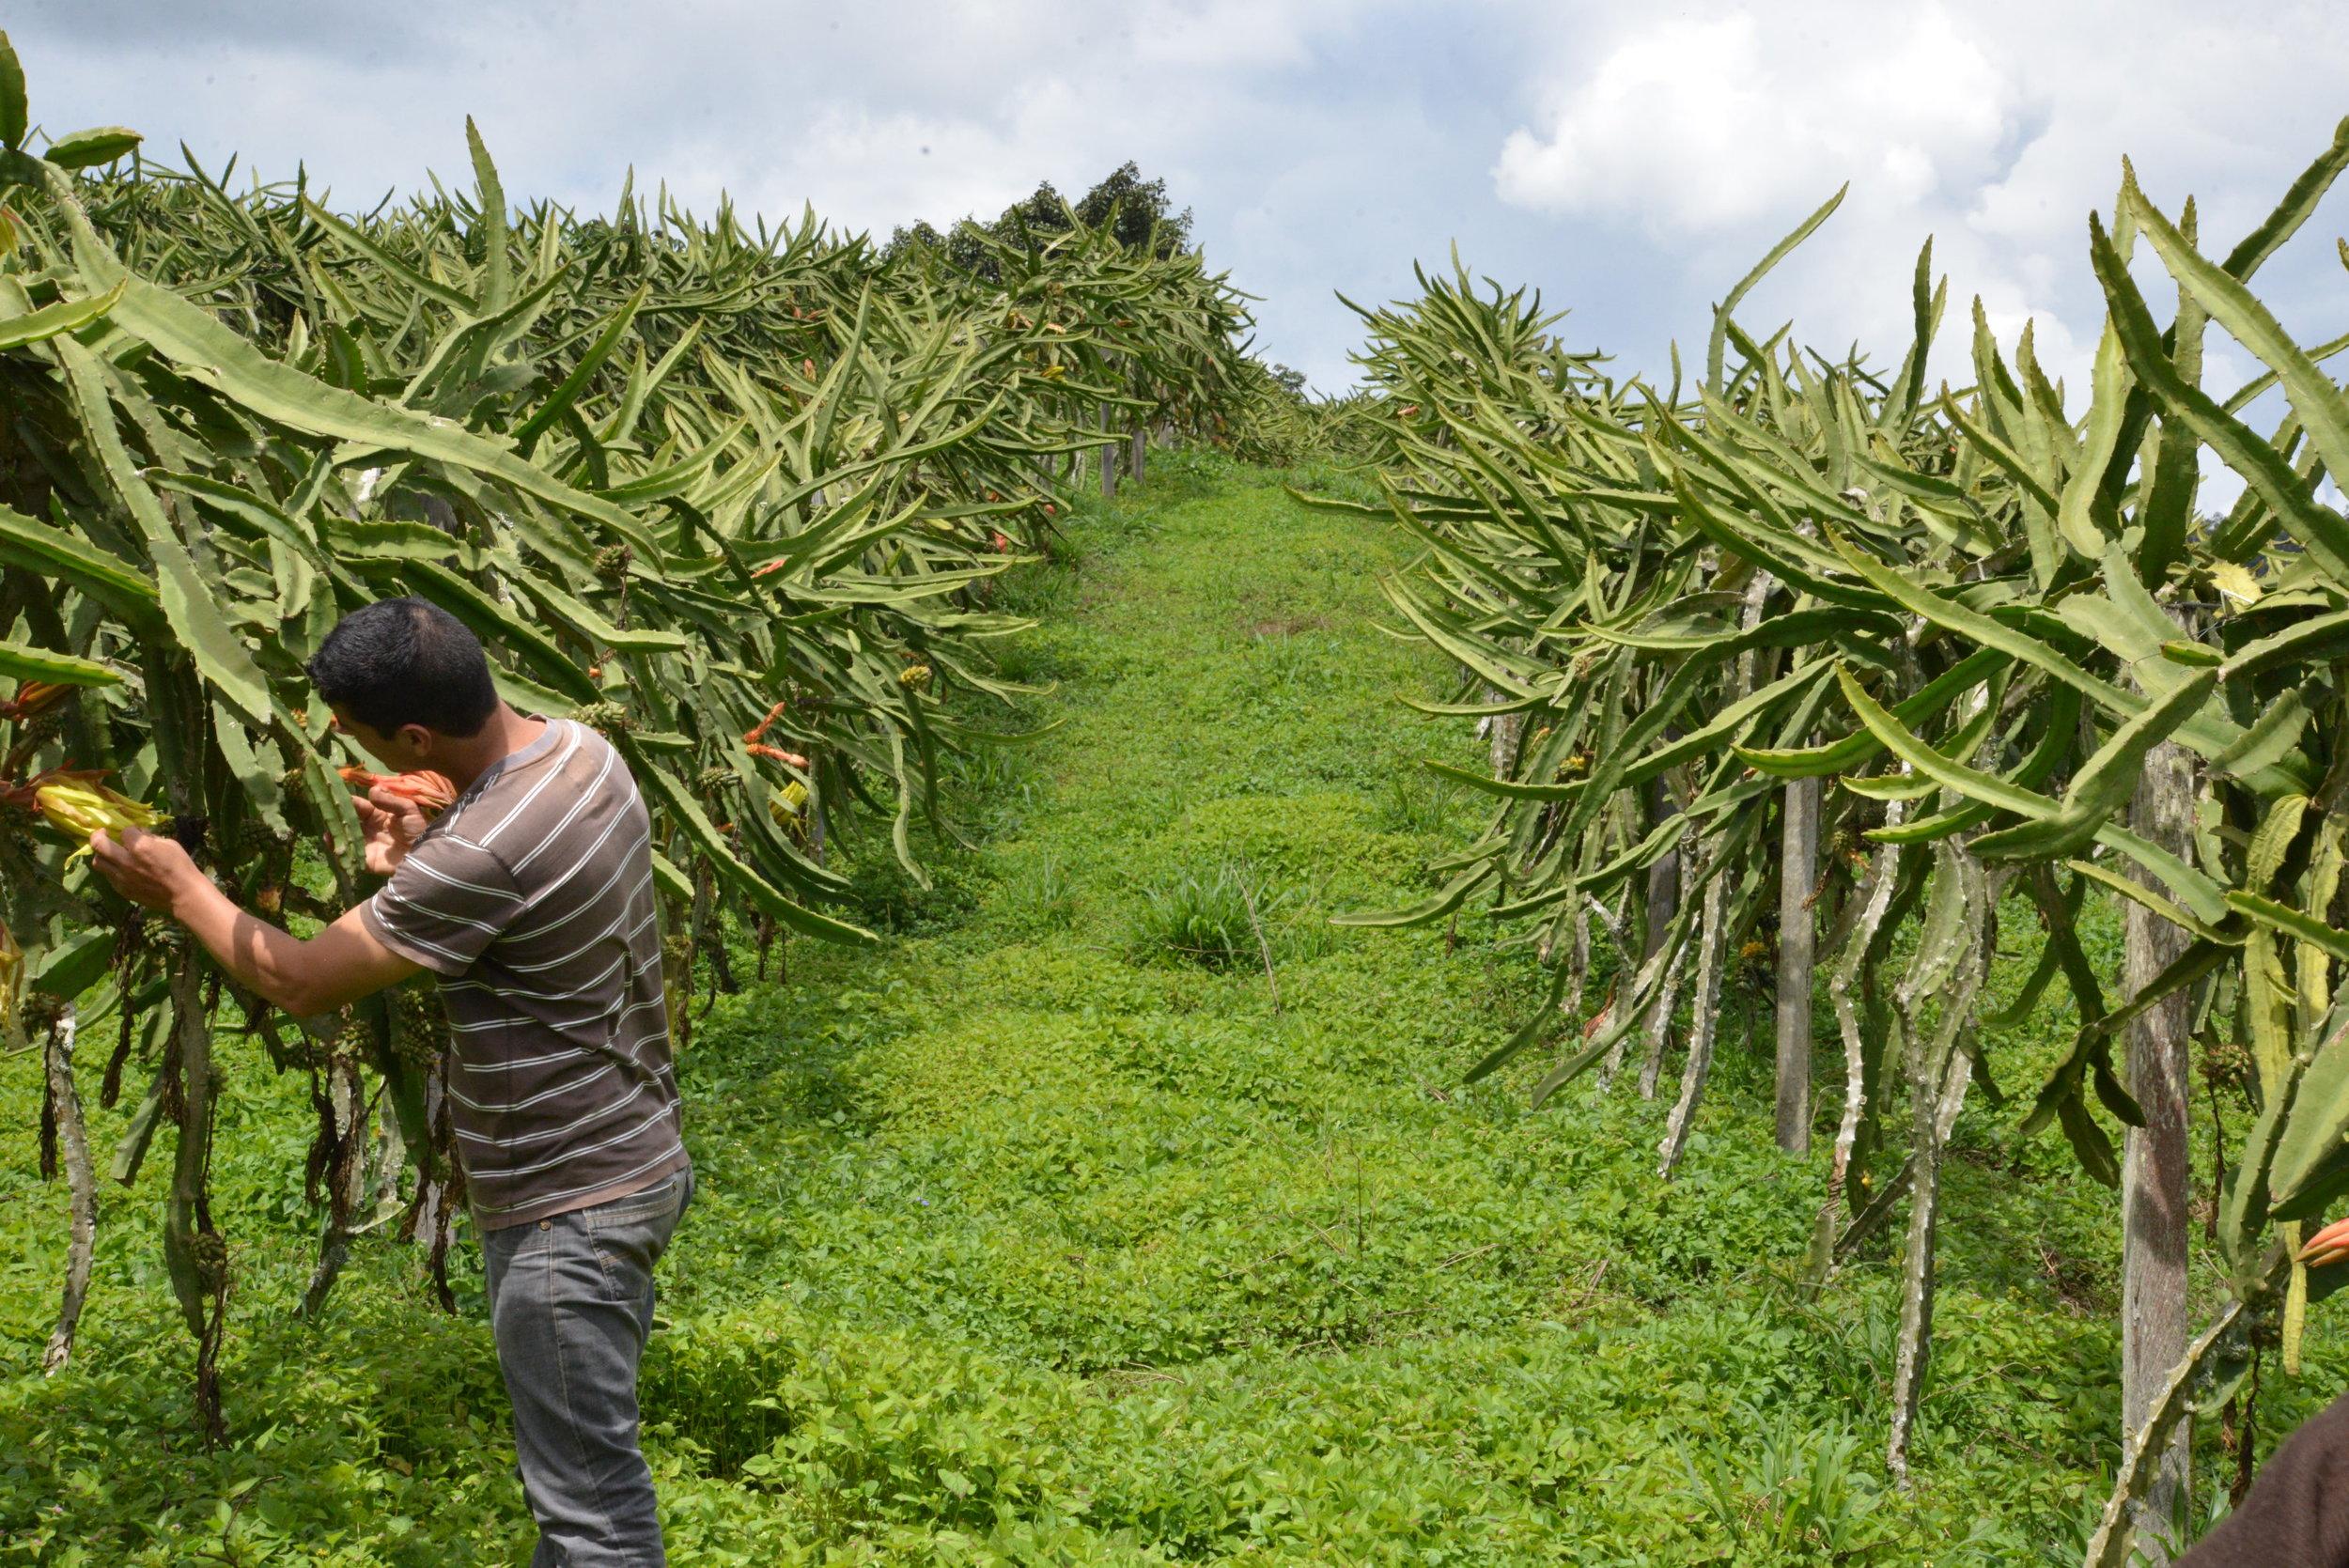 The vineyard-like rows of dragon fruit!